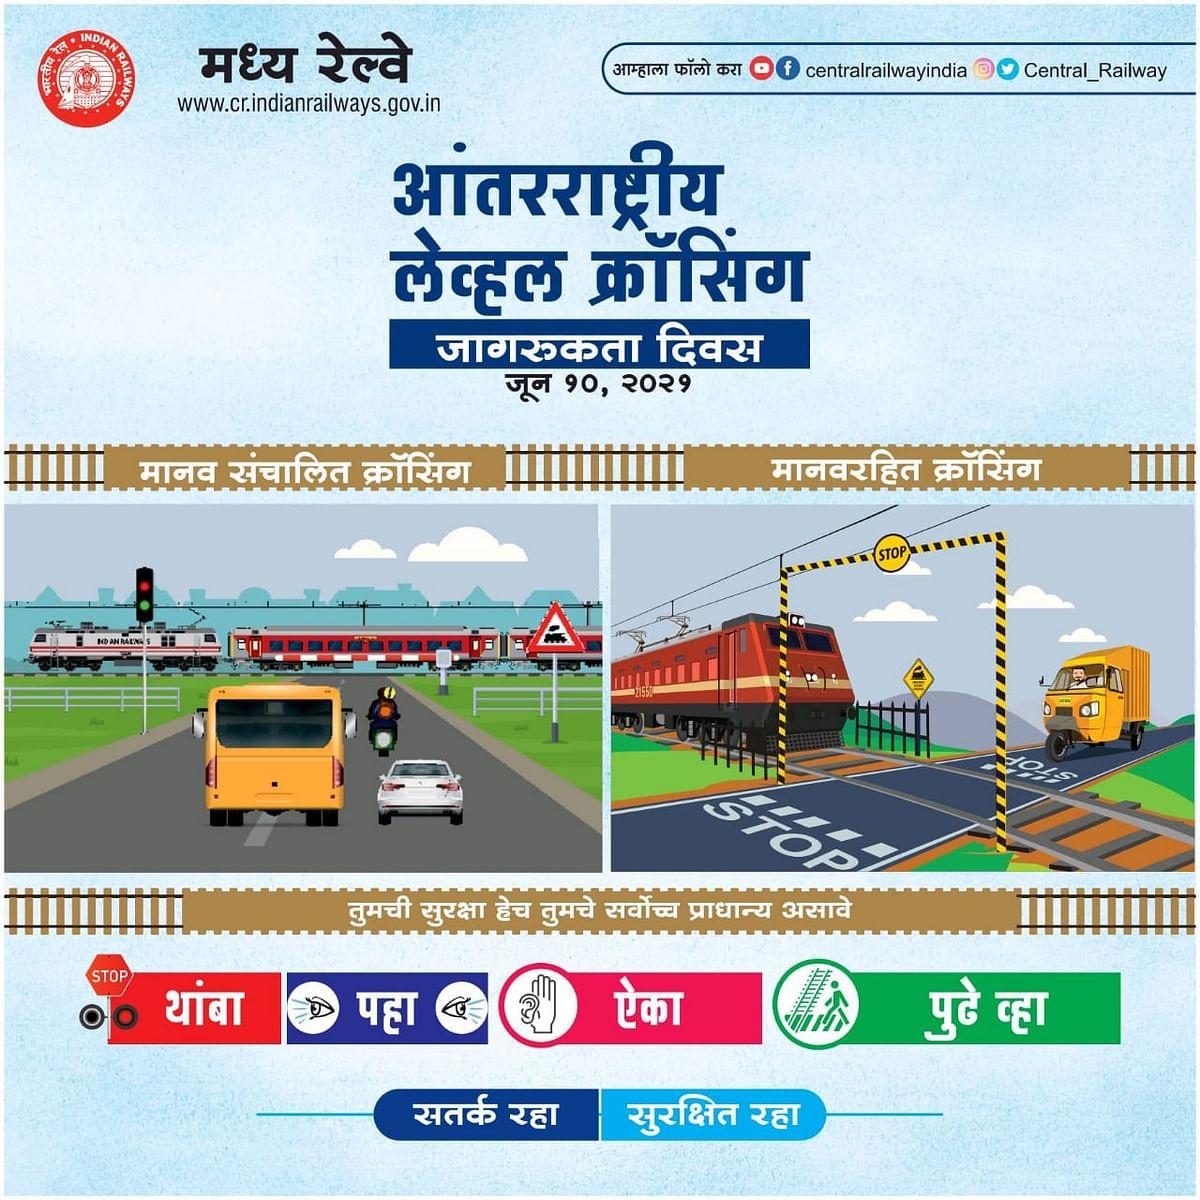 Central Railway observes International Level Crossing Awareness Day on June 10